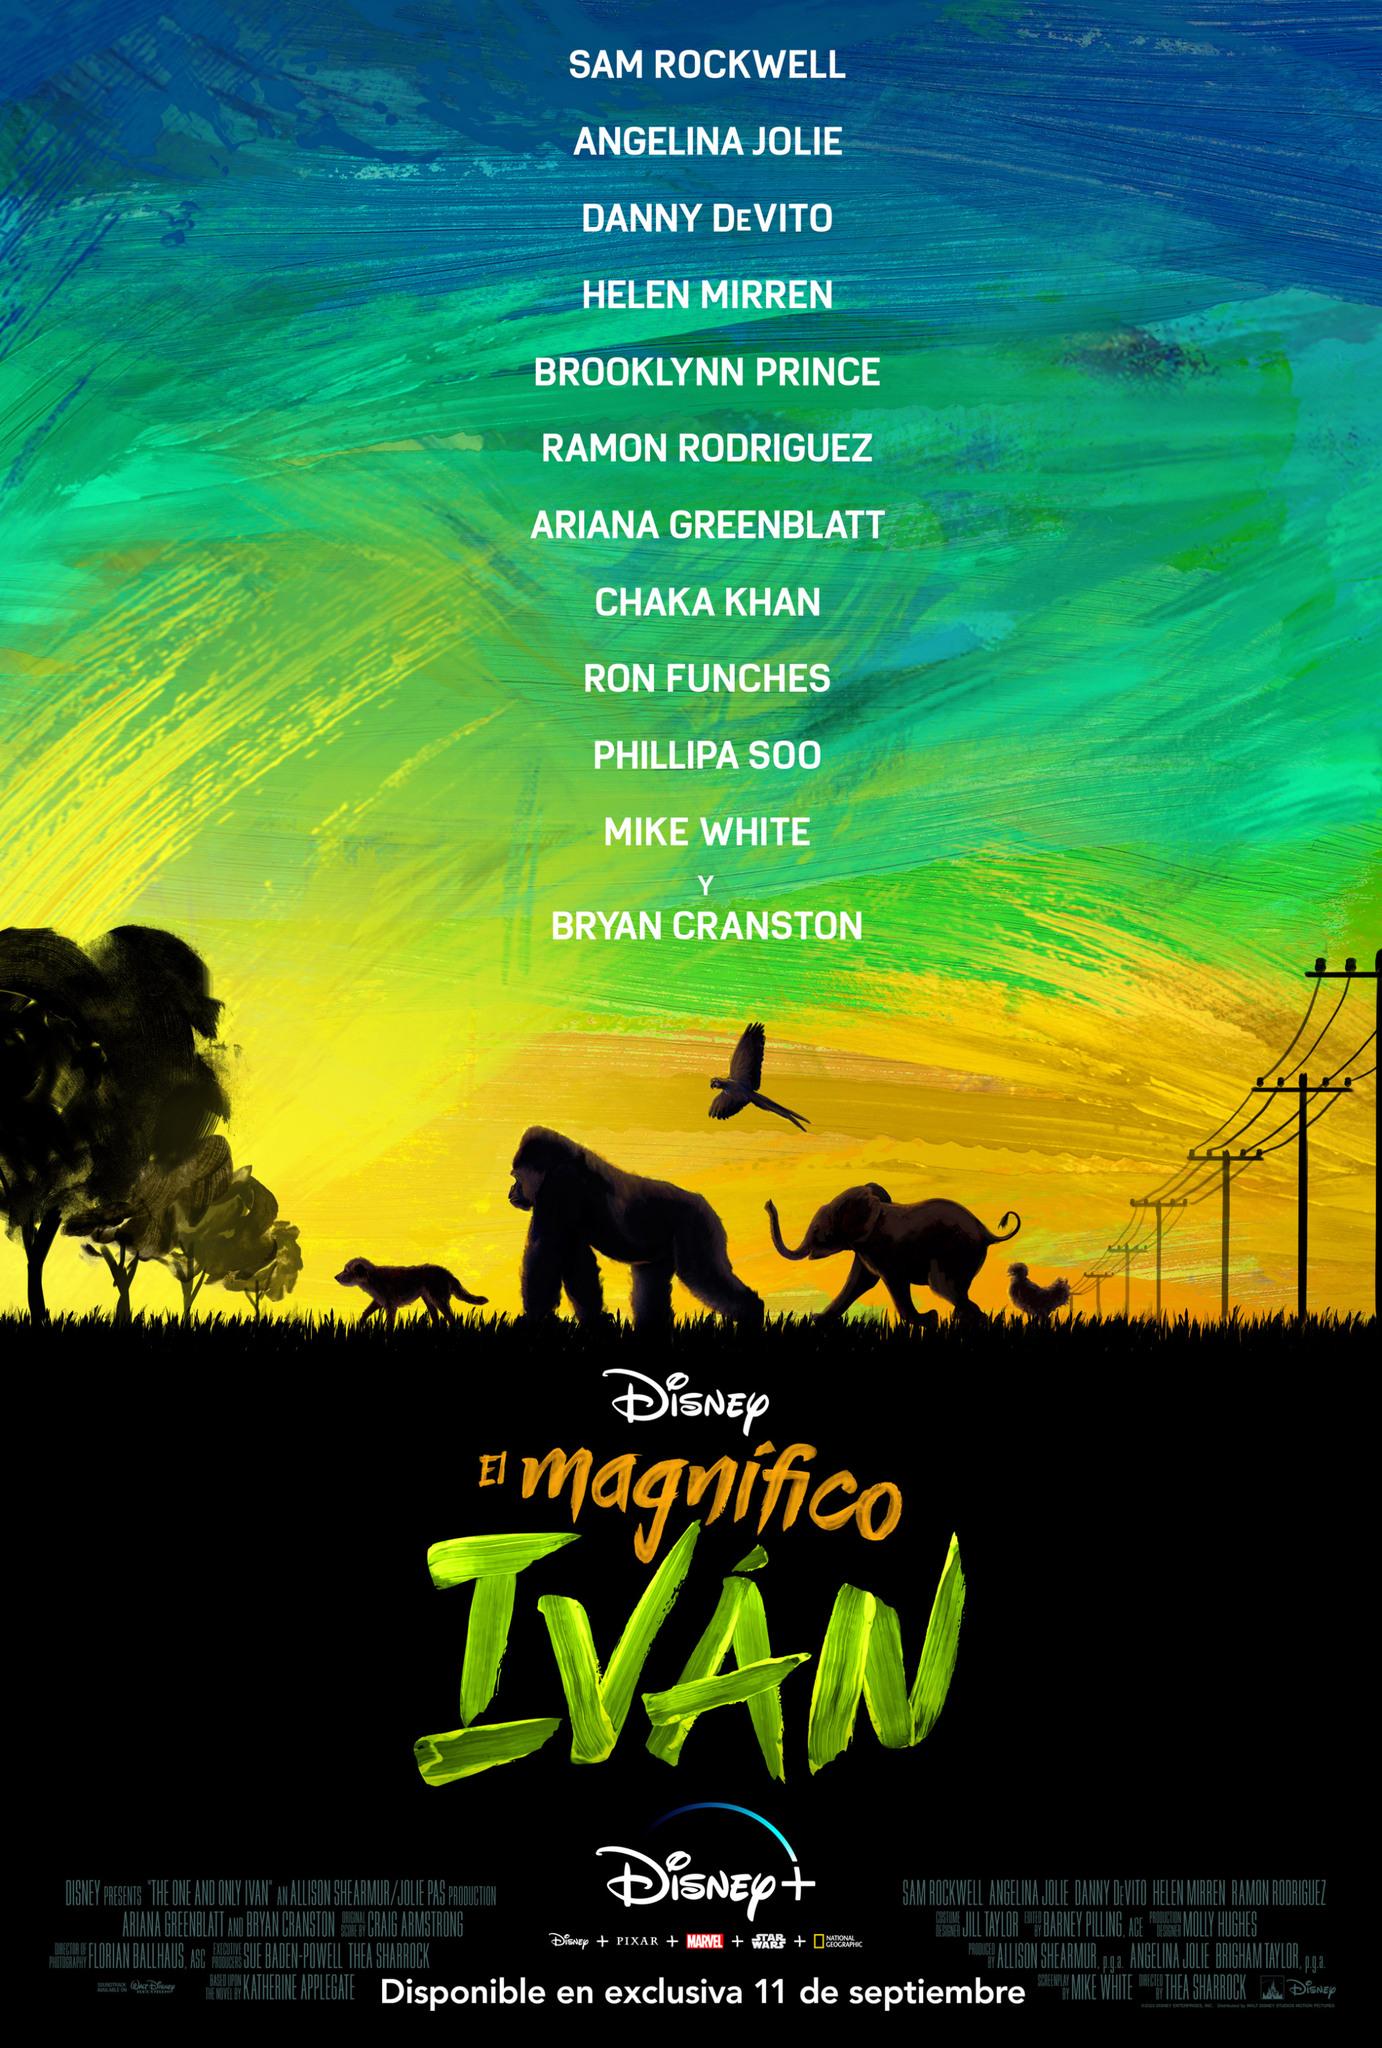 'El Magnífico Iván': Ansías de libertad